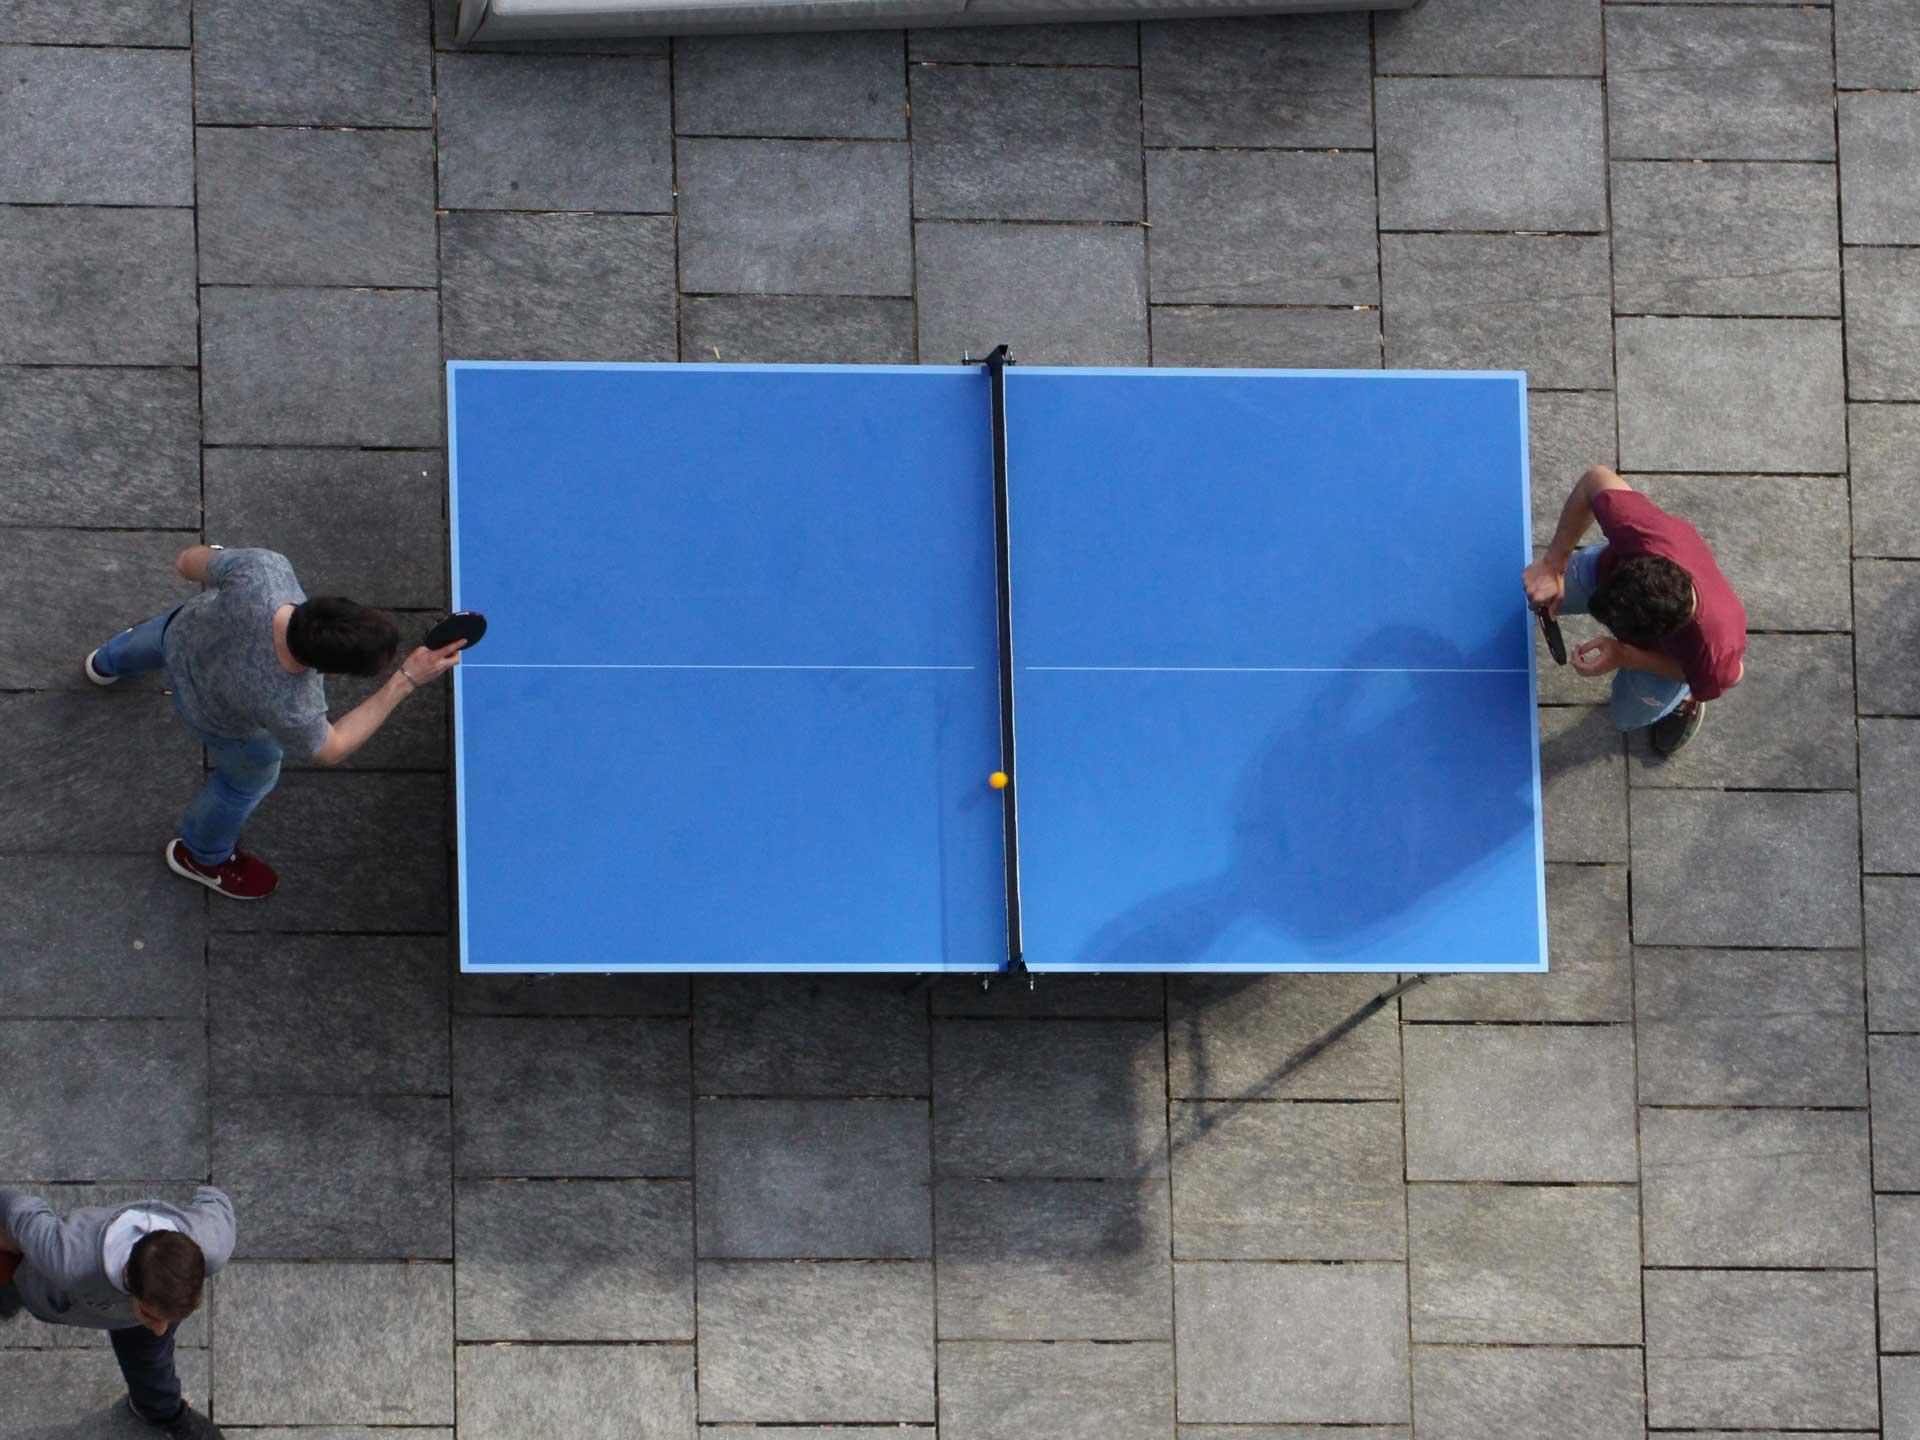 Ping-Pong - Noleggiocampi.it